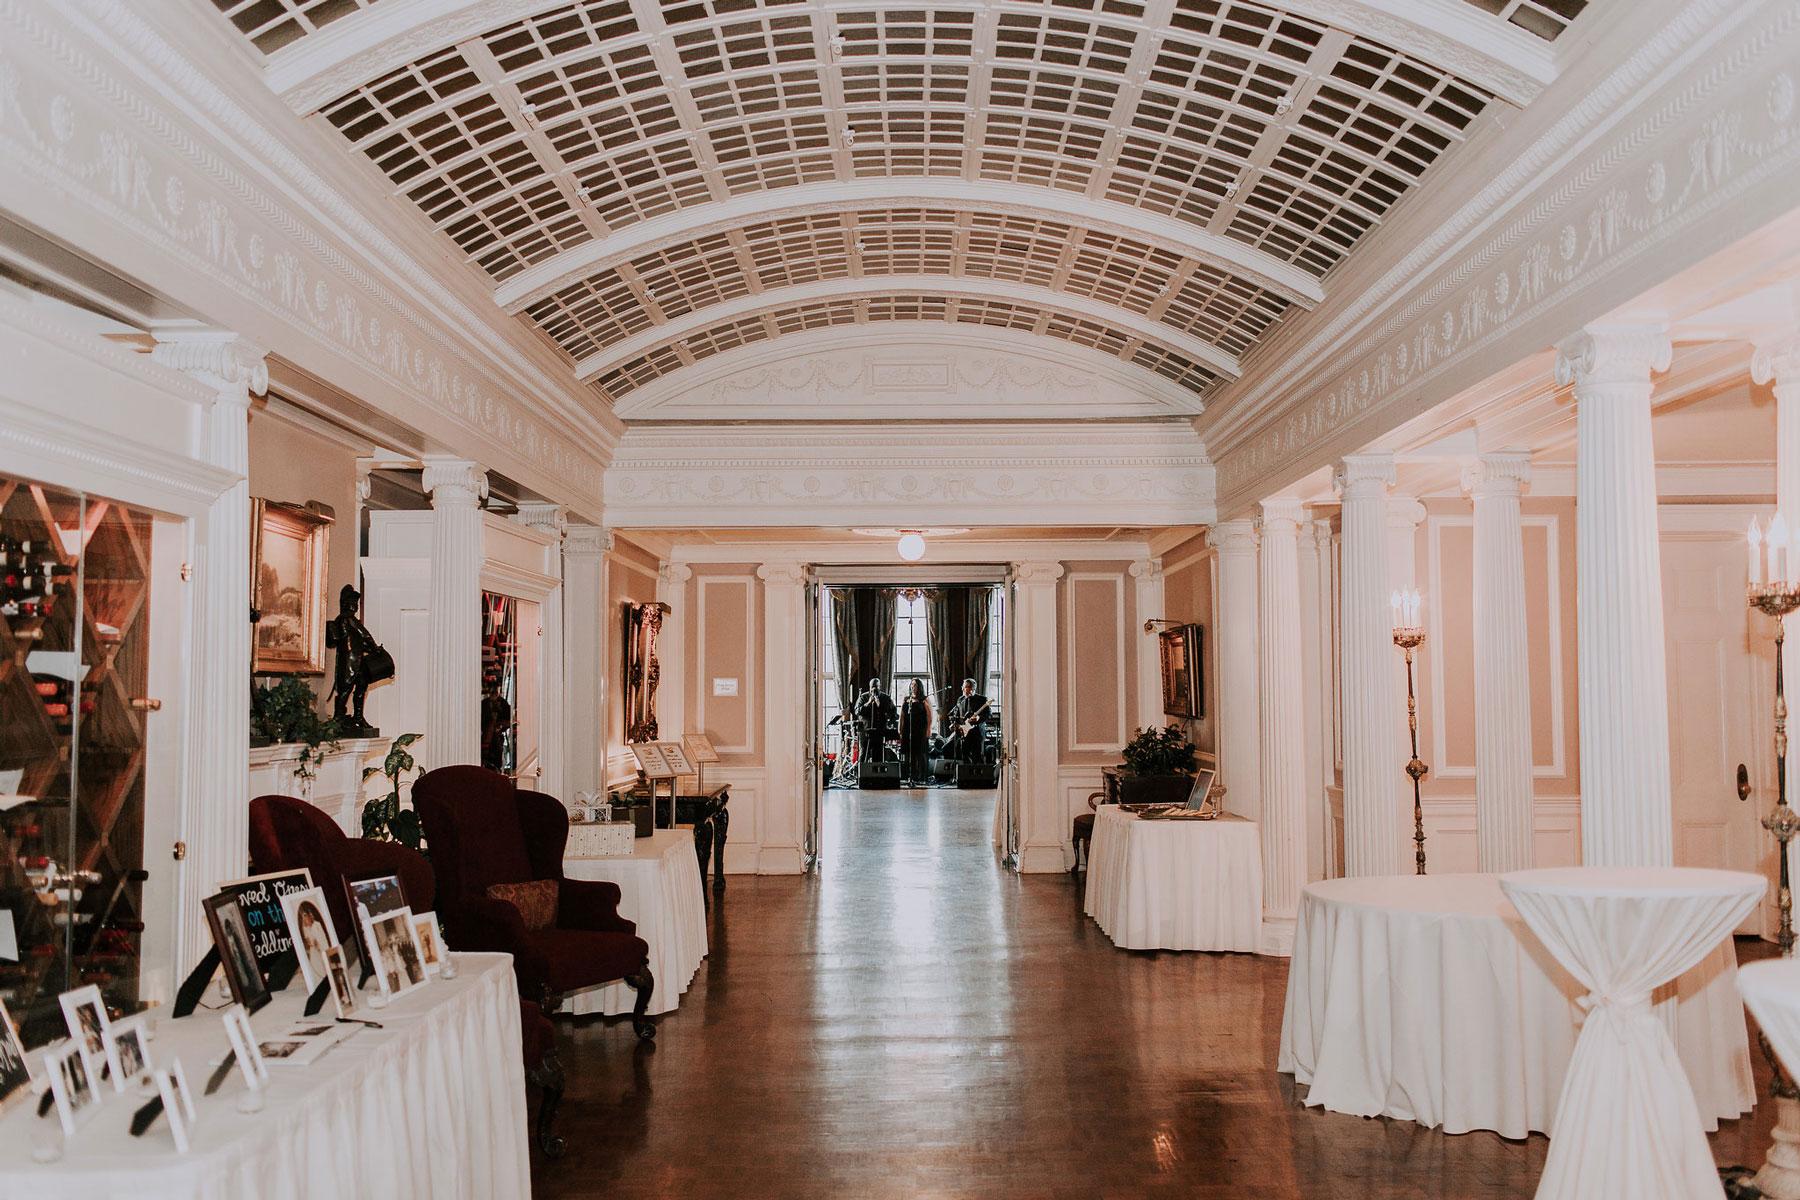 The-Toledo-Club-Wedding-Dana-Doug-Vafa-Photo149.jpg